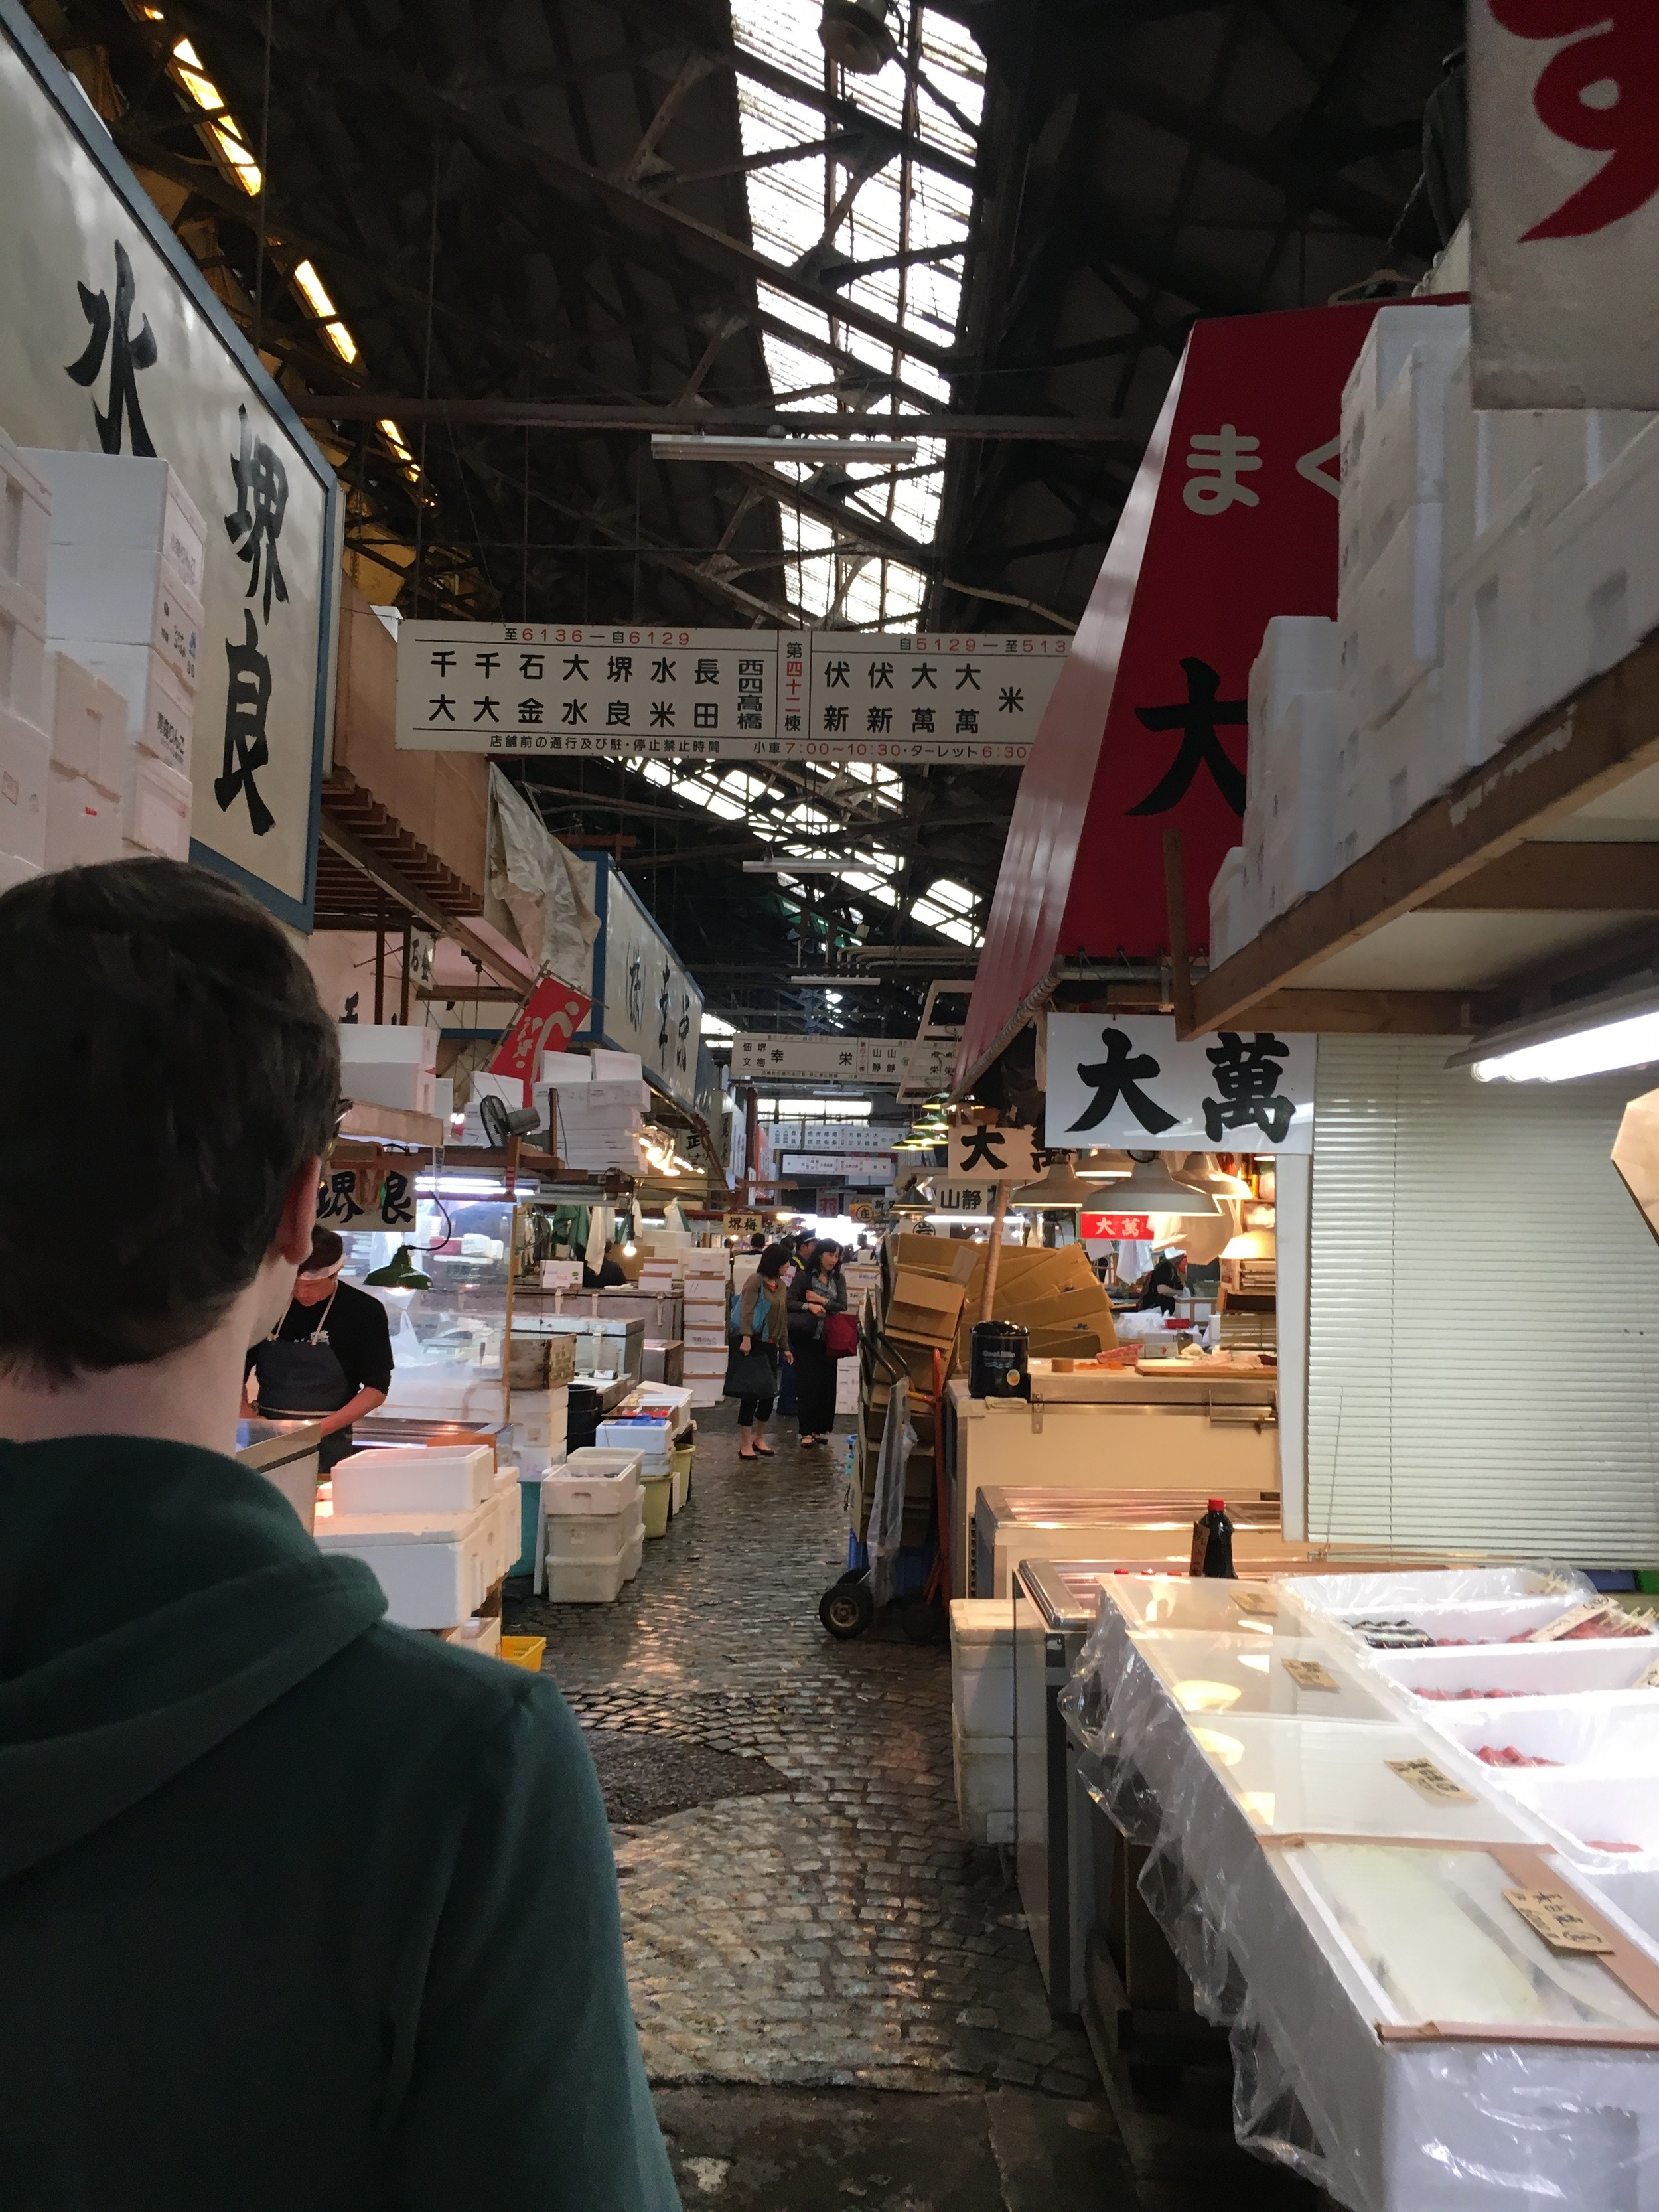 Inside the Tsukiji Market.